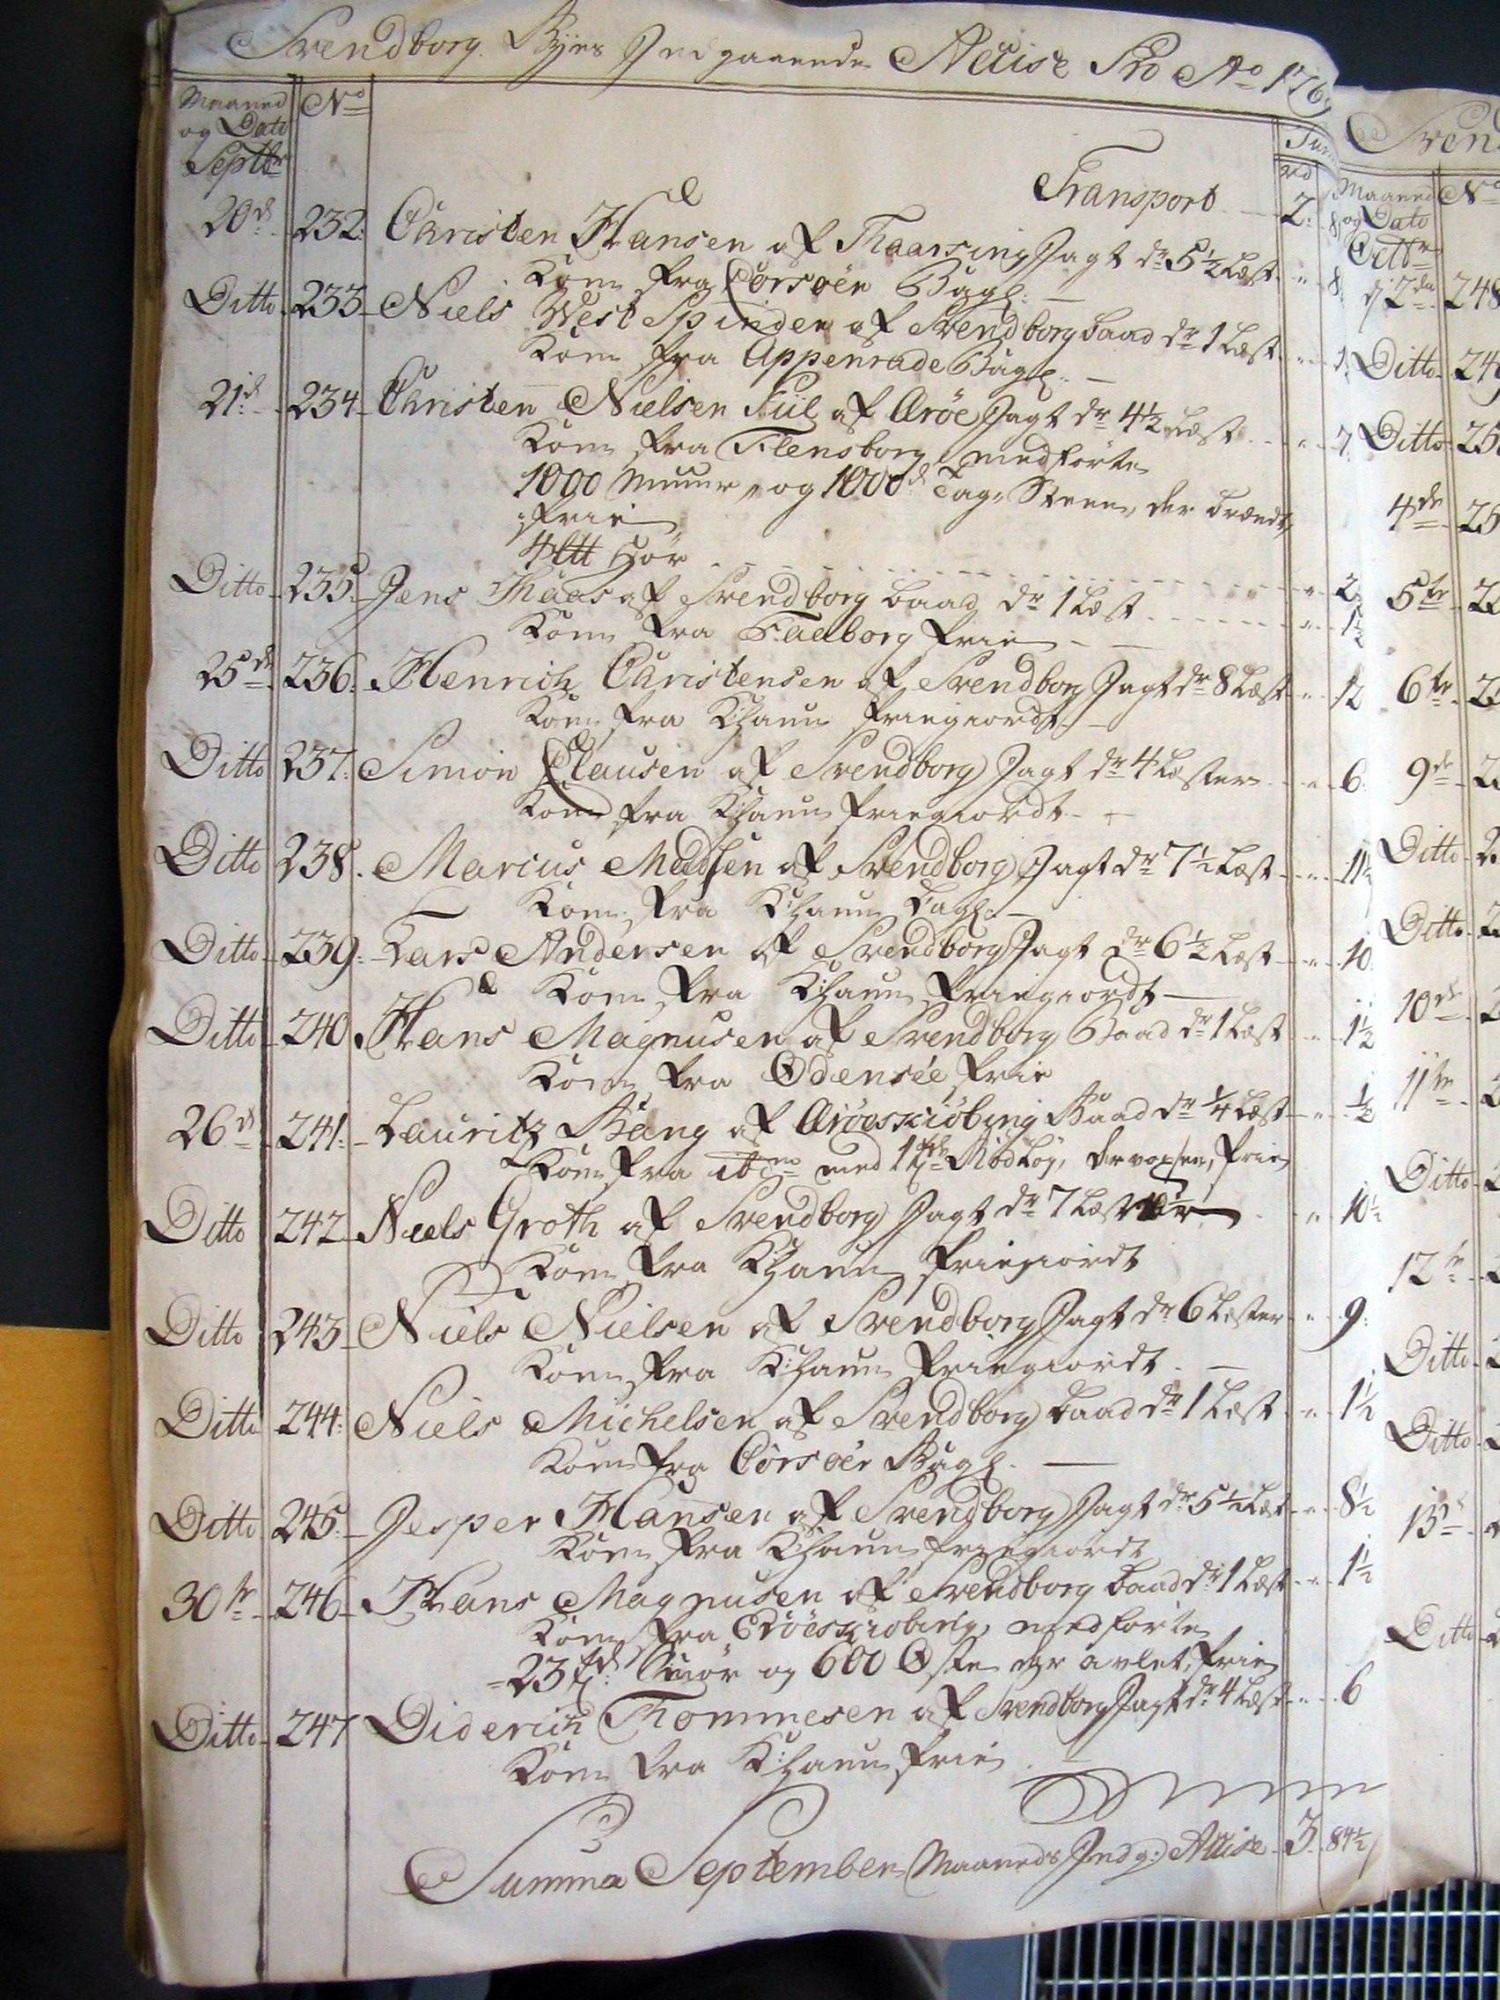 Svendborg Byes Acciseregnskab for Anno 1769 (18)